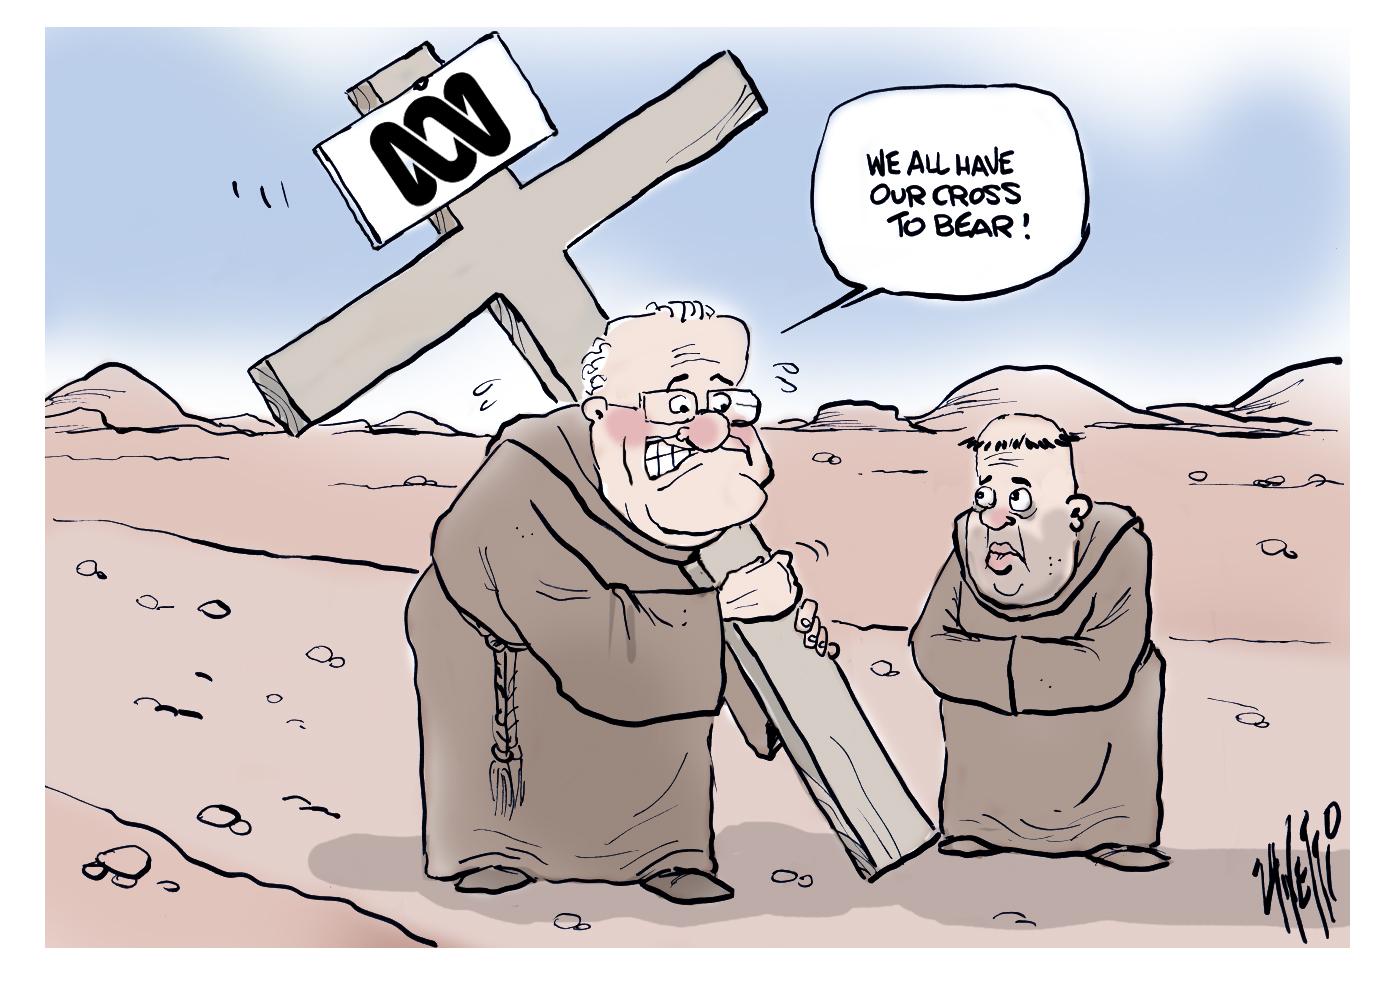 ABC attacks Morrison Christian Faith